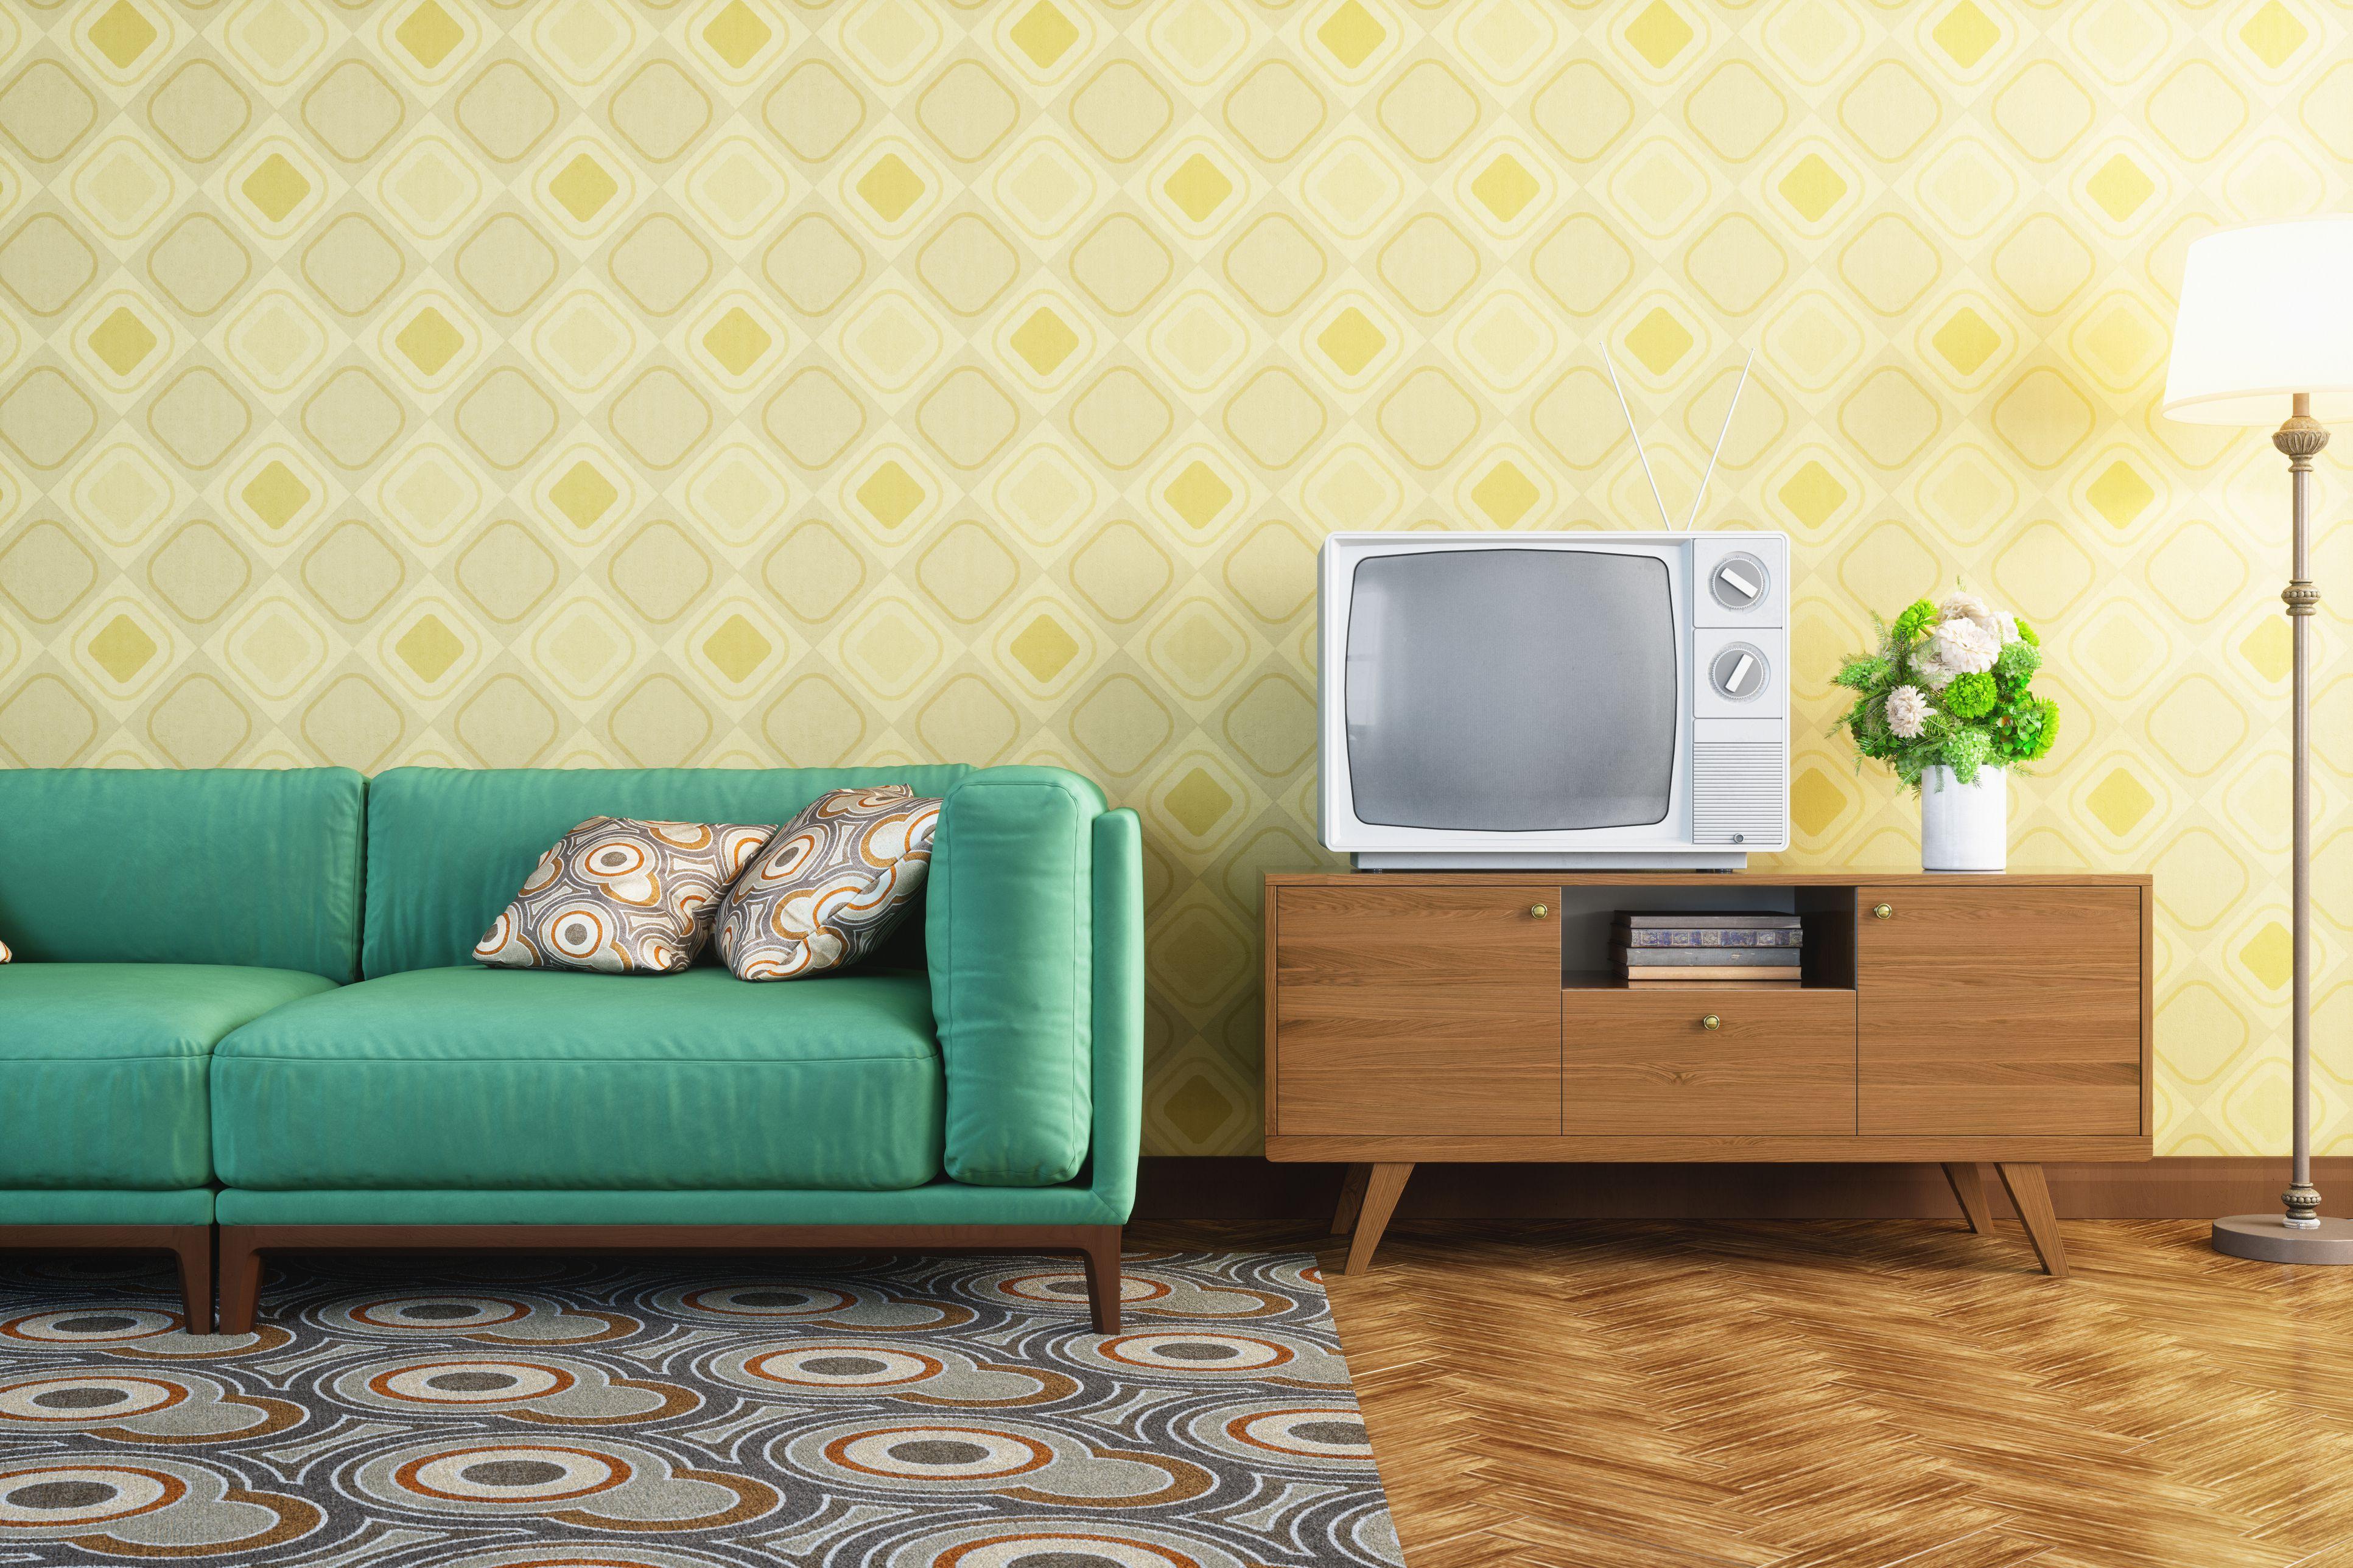 7 Tips For Amazing Retro Style Decorating